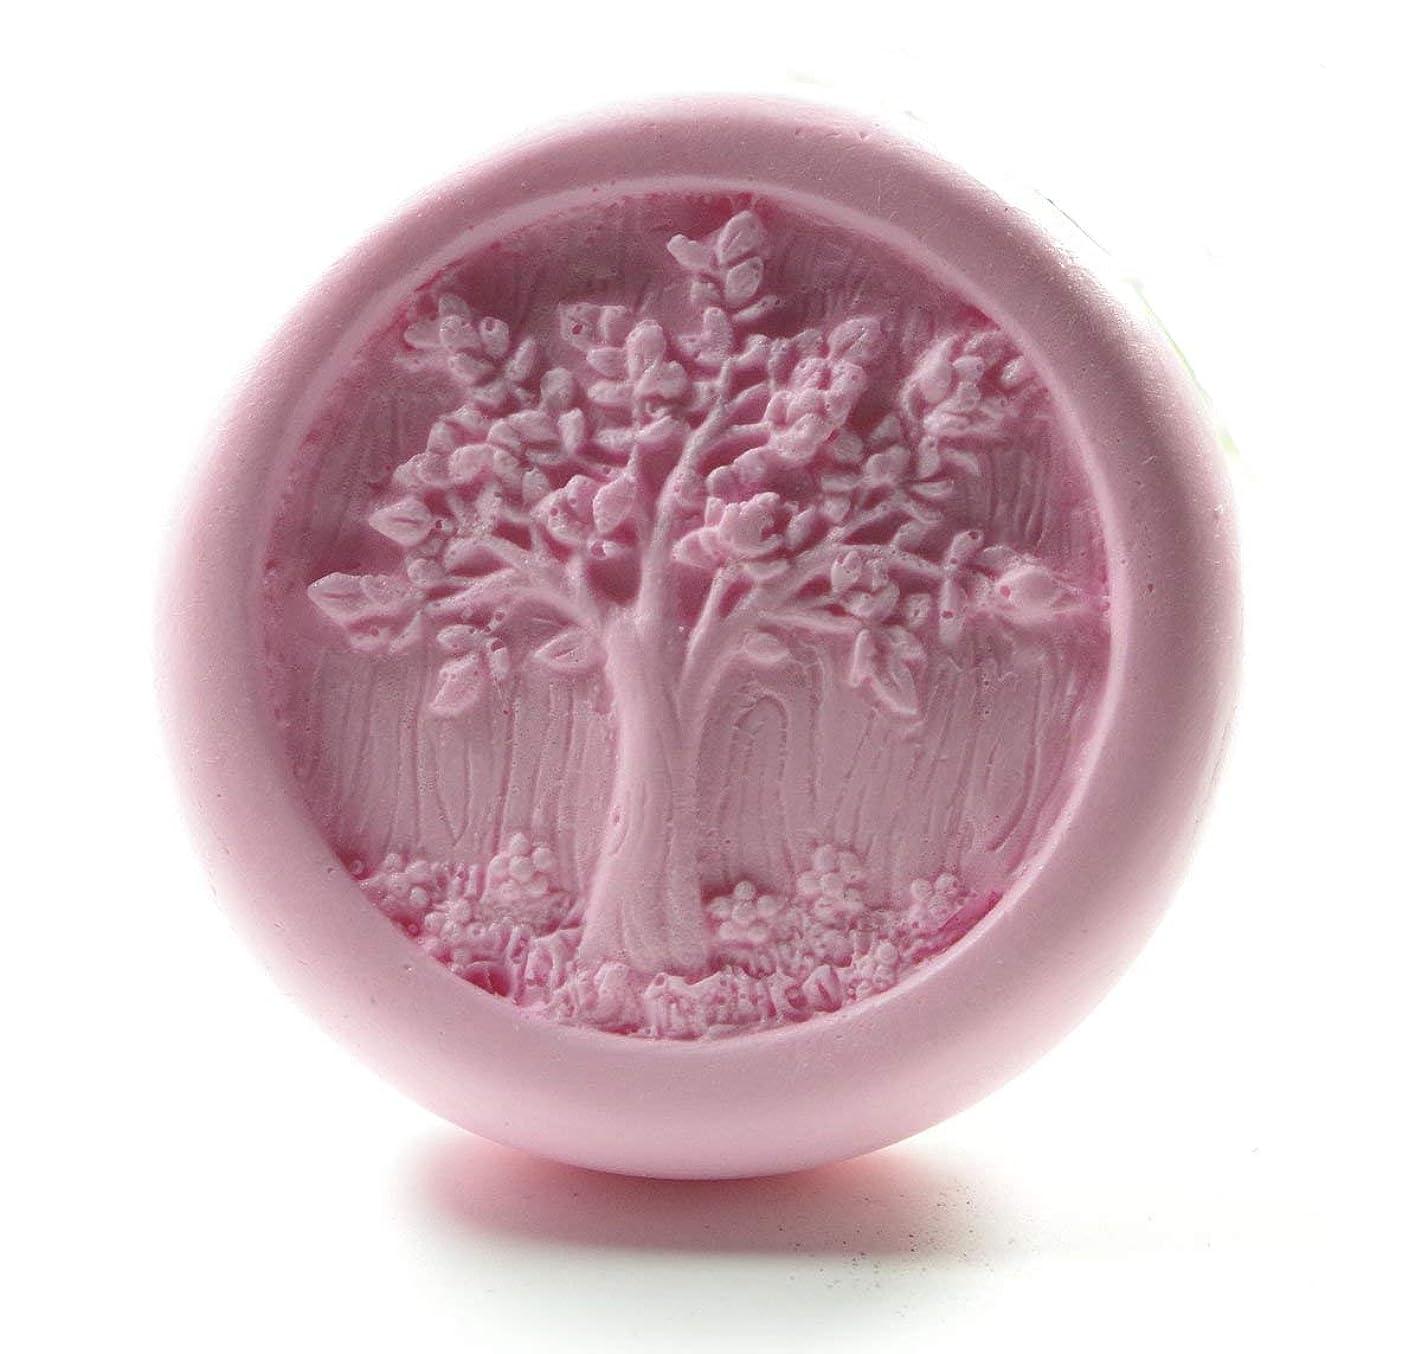 Life Tree Soap Molds Silicone Soap Mold Craft Molds DIY Handmade Longzang Mold (S424)